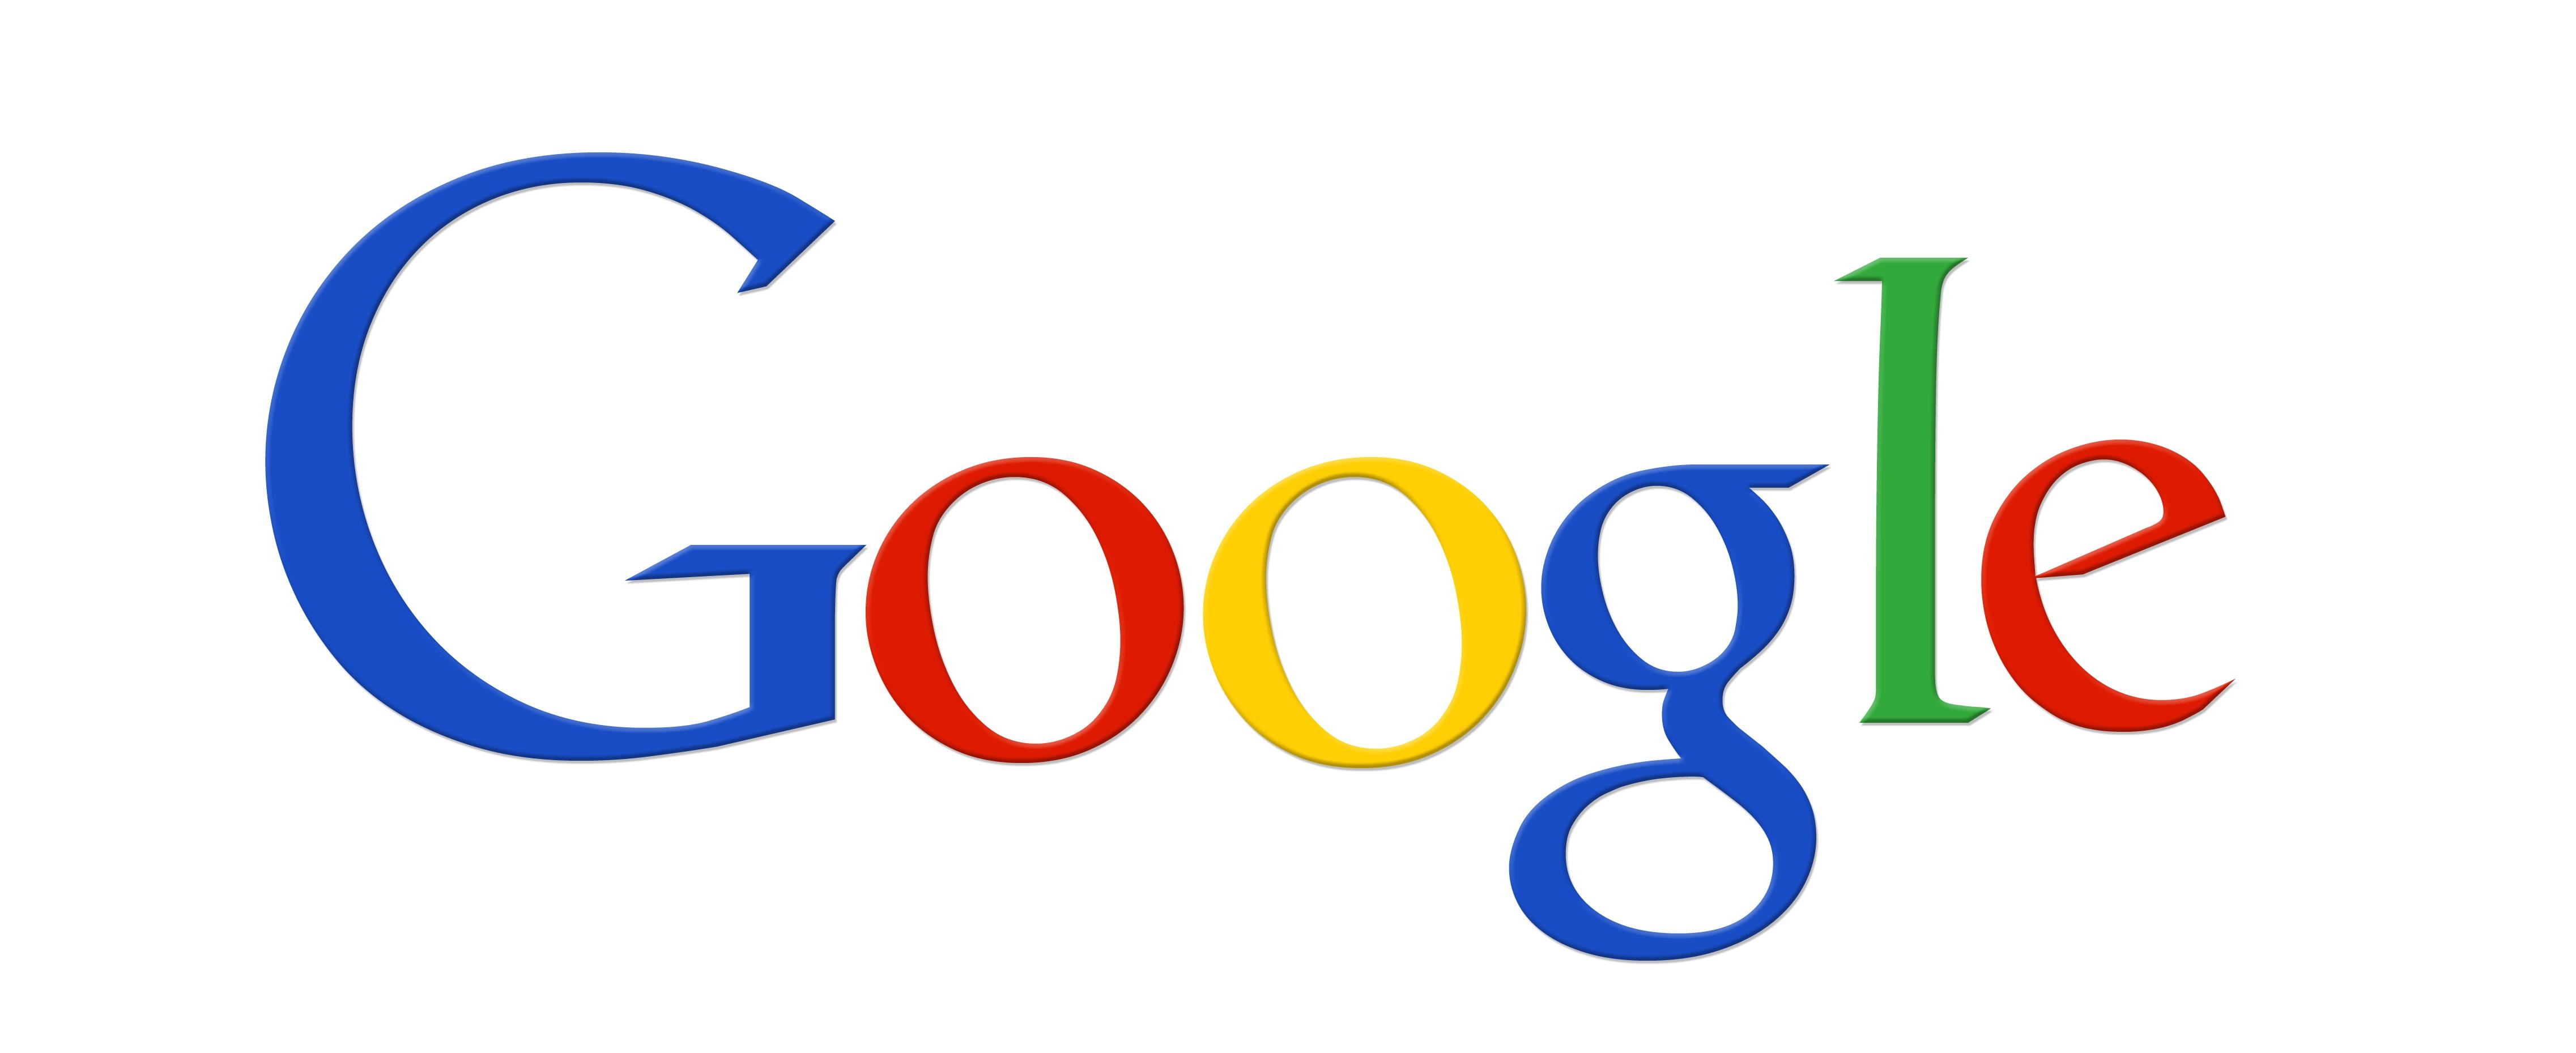 Google: Θα επενδύσει 3 δισ. ευρώ σε ευρωπαϊκά κέντρα δεδομένων ...